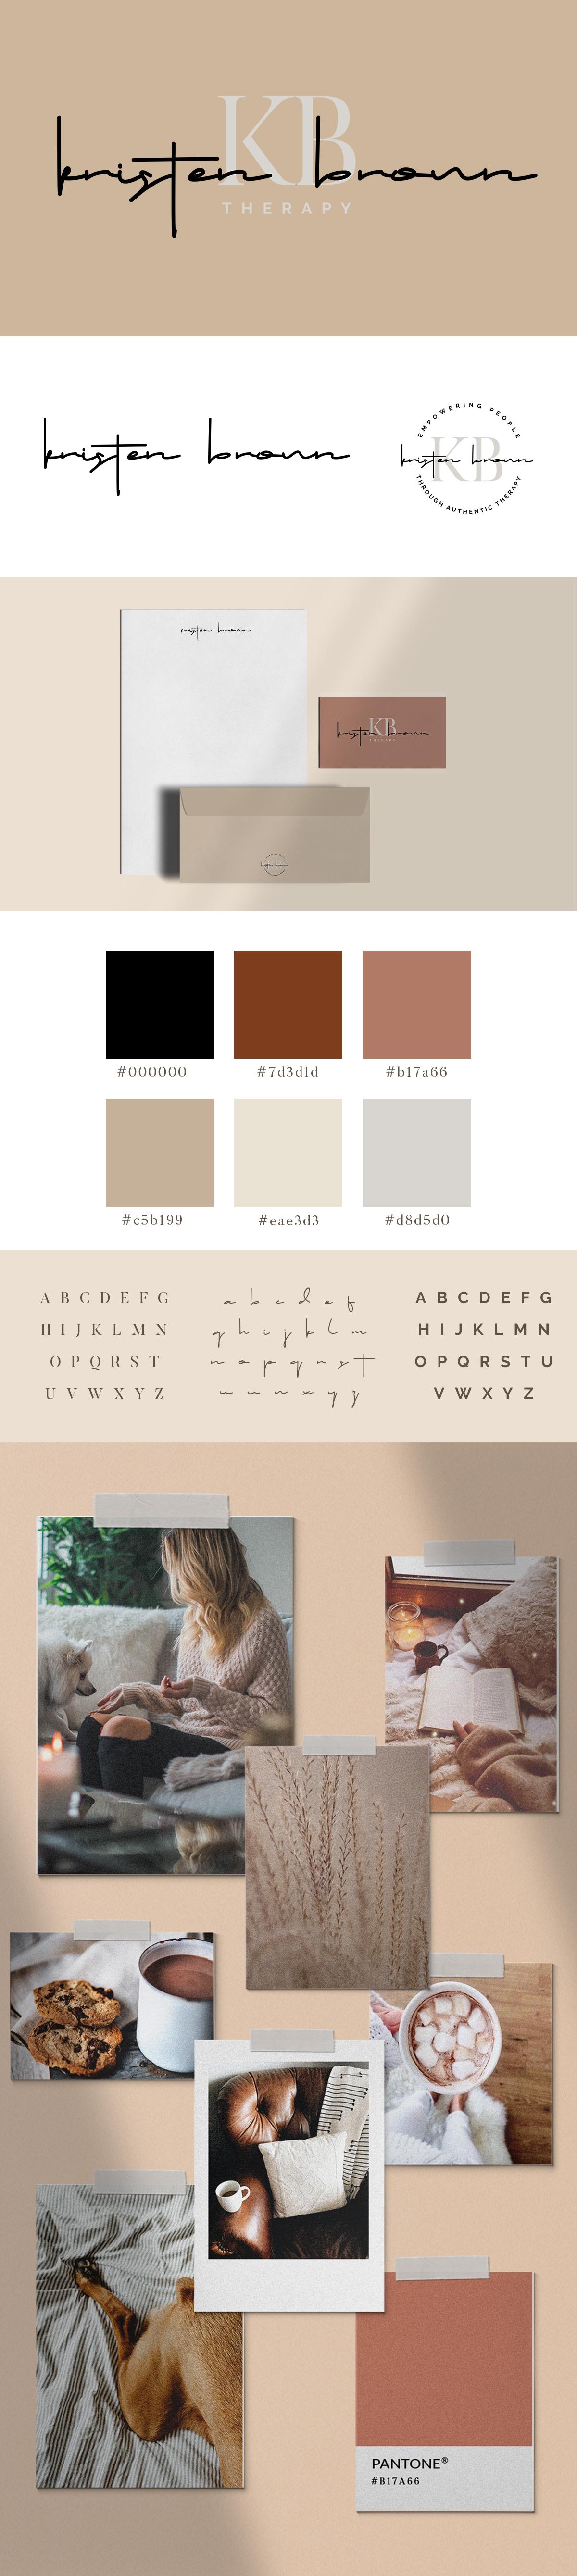 Kristen brown Cozy Therapy Brand Board.jpg